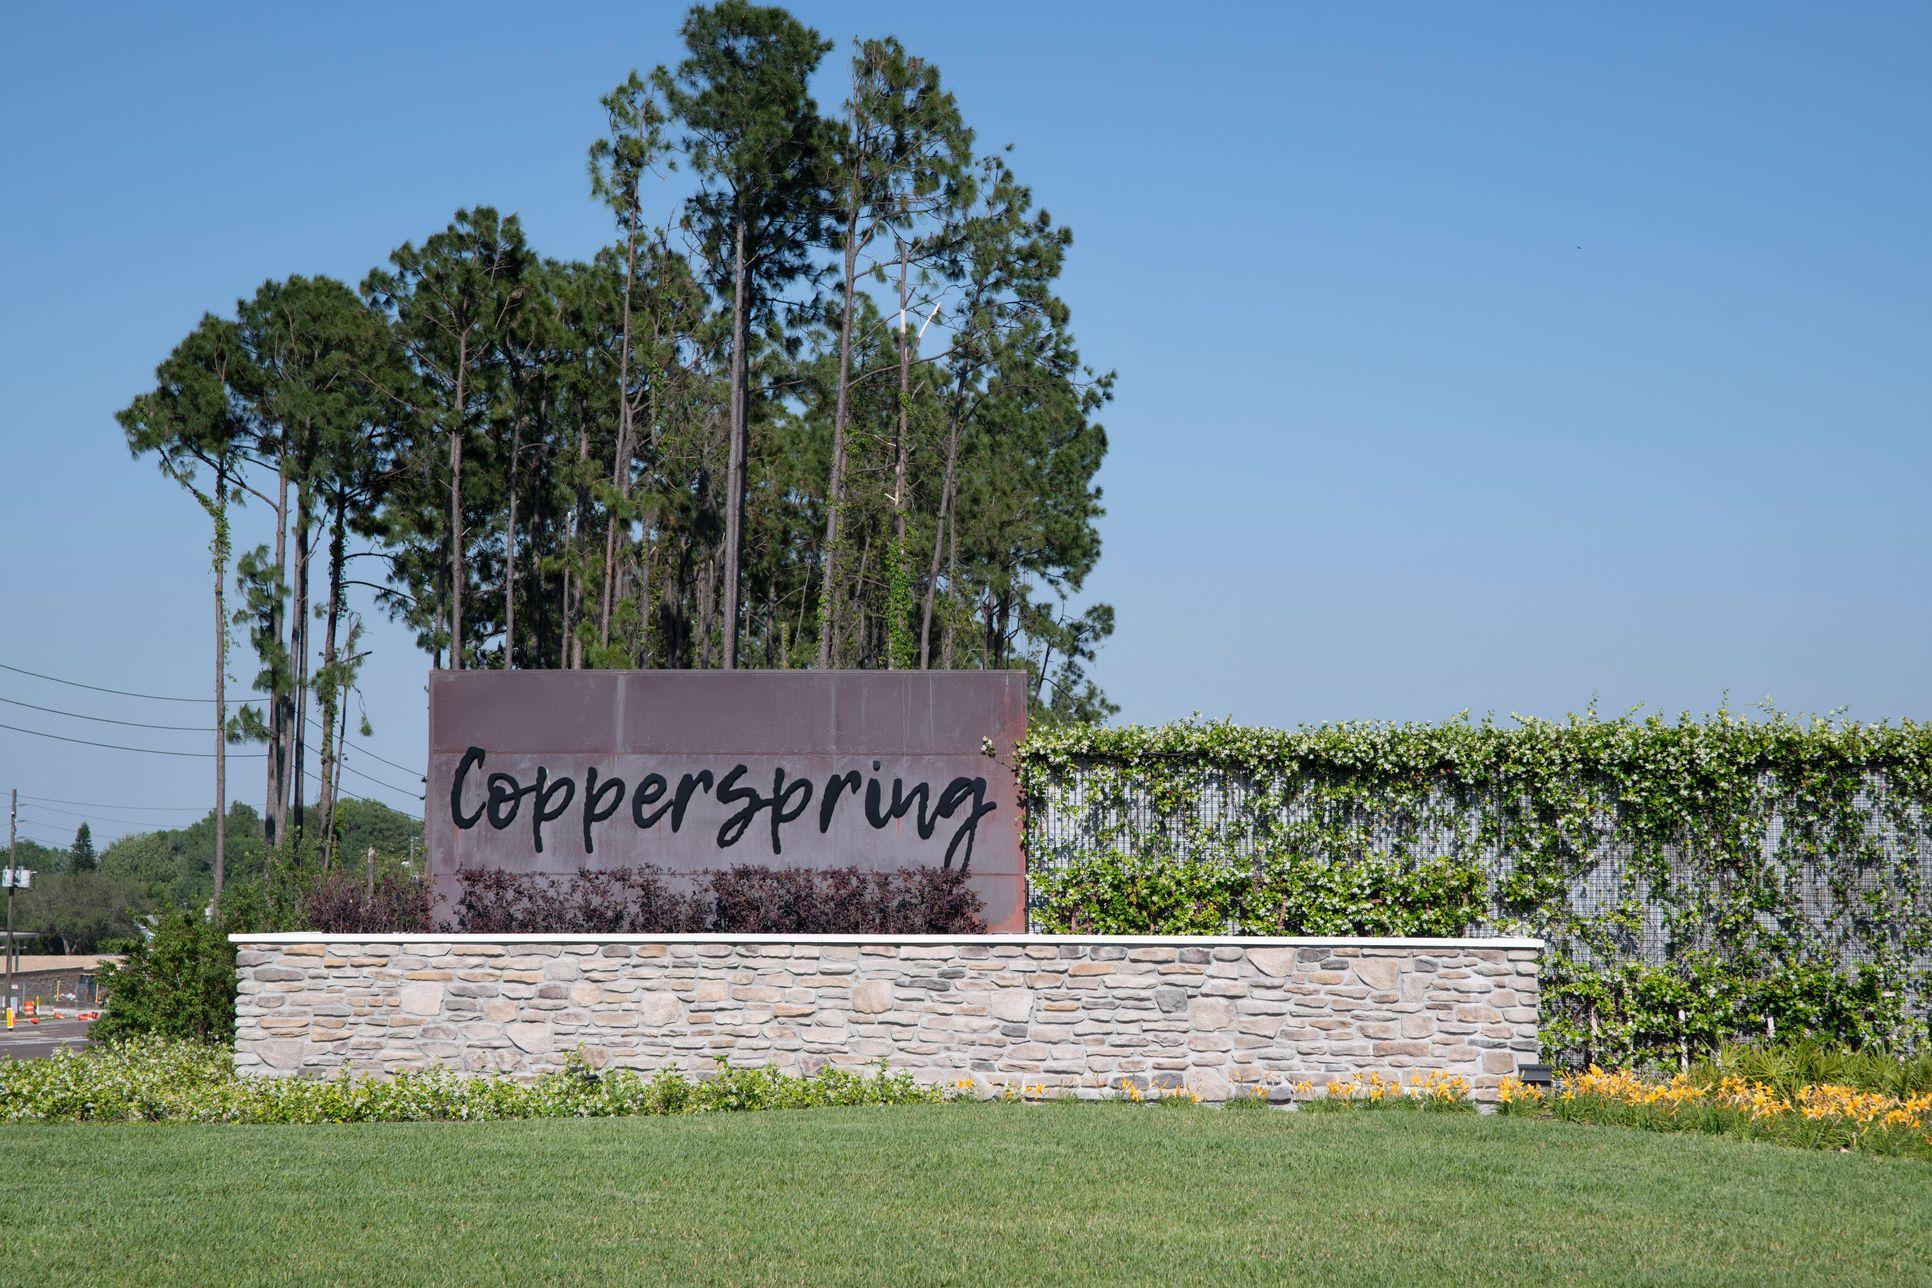 Copperspring sign